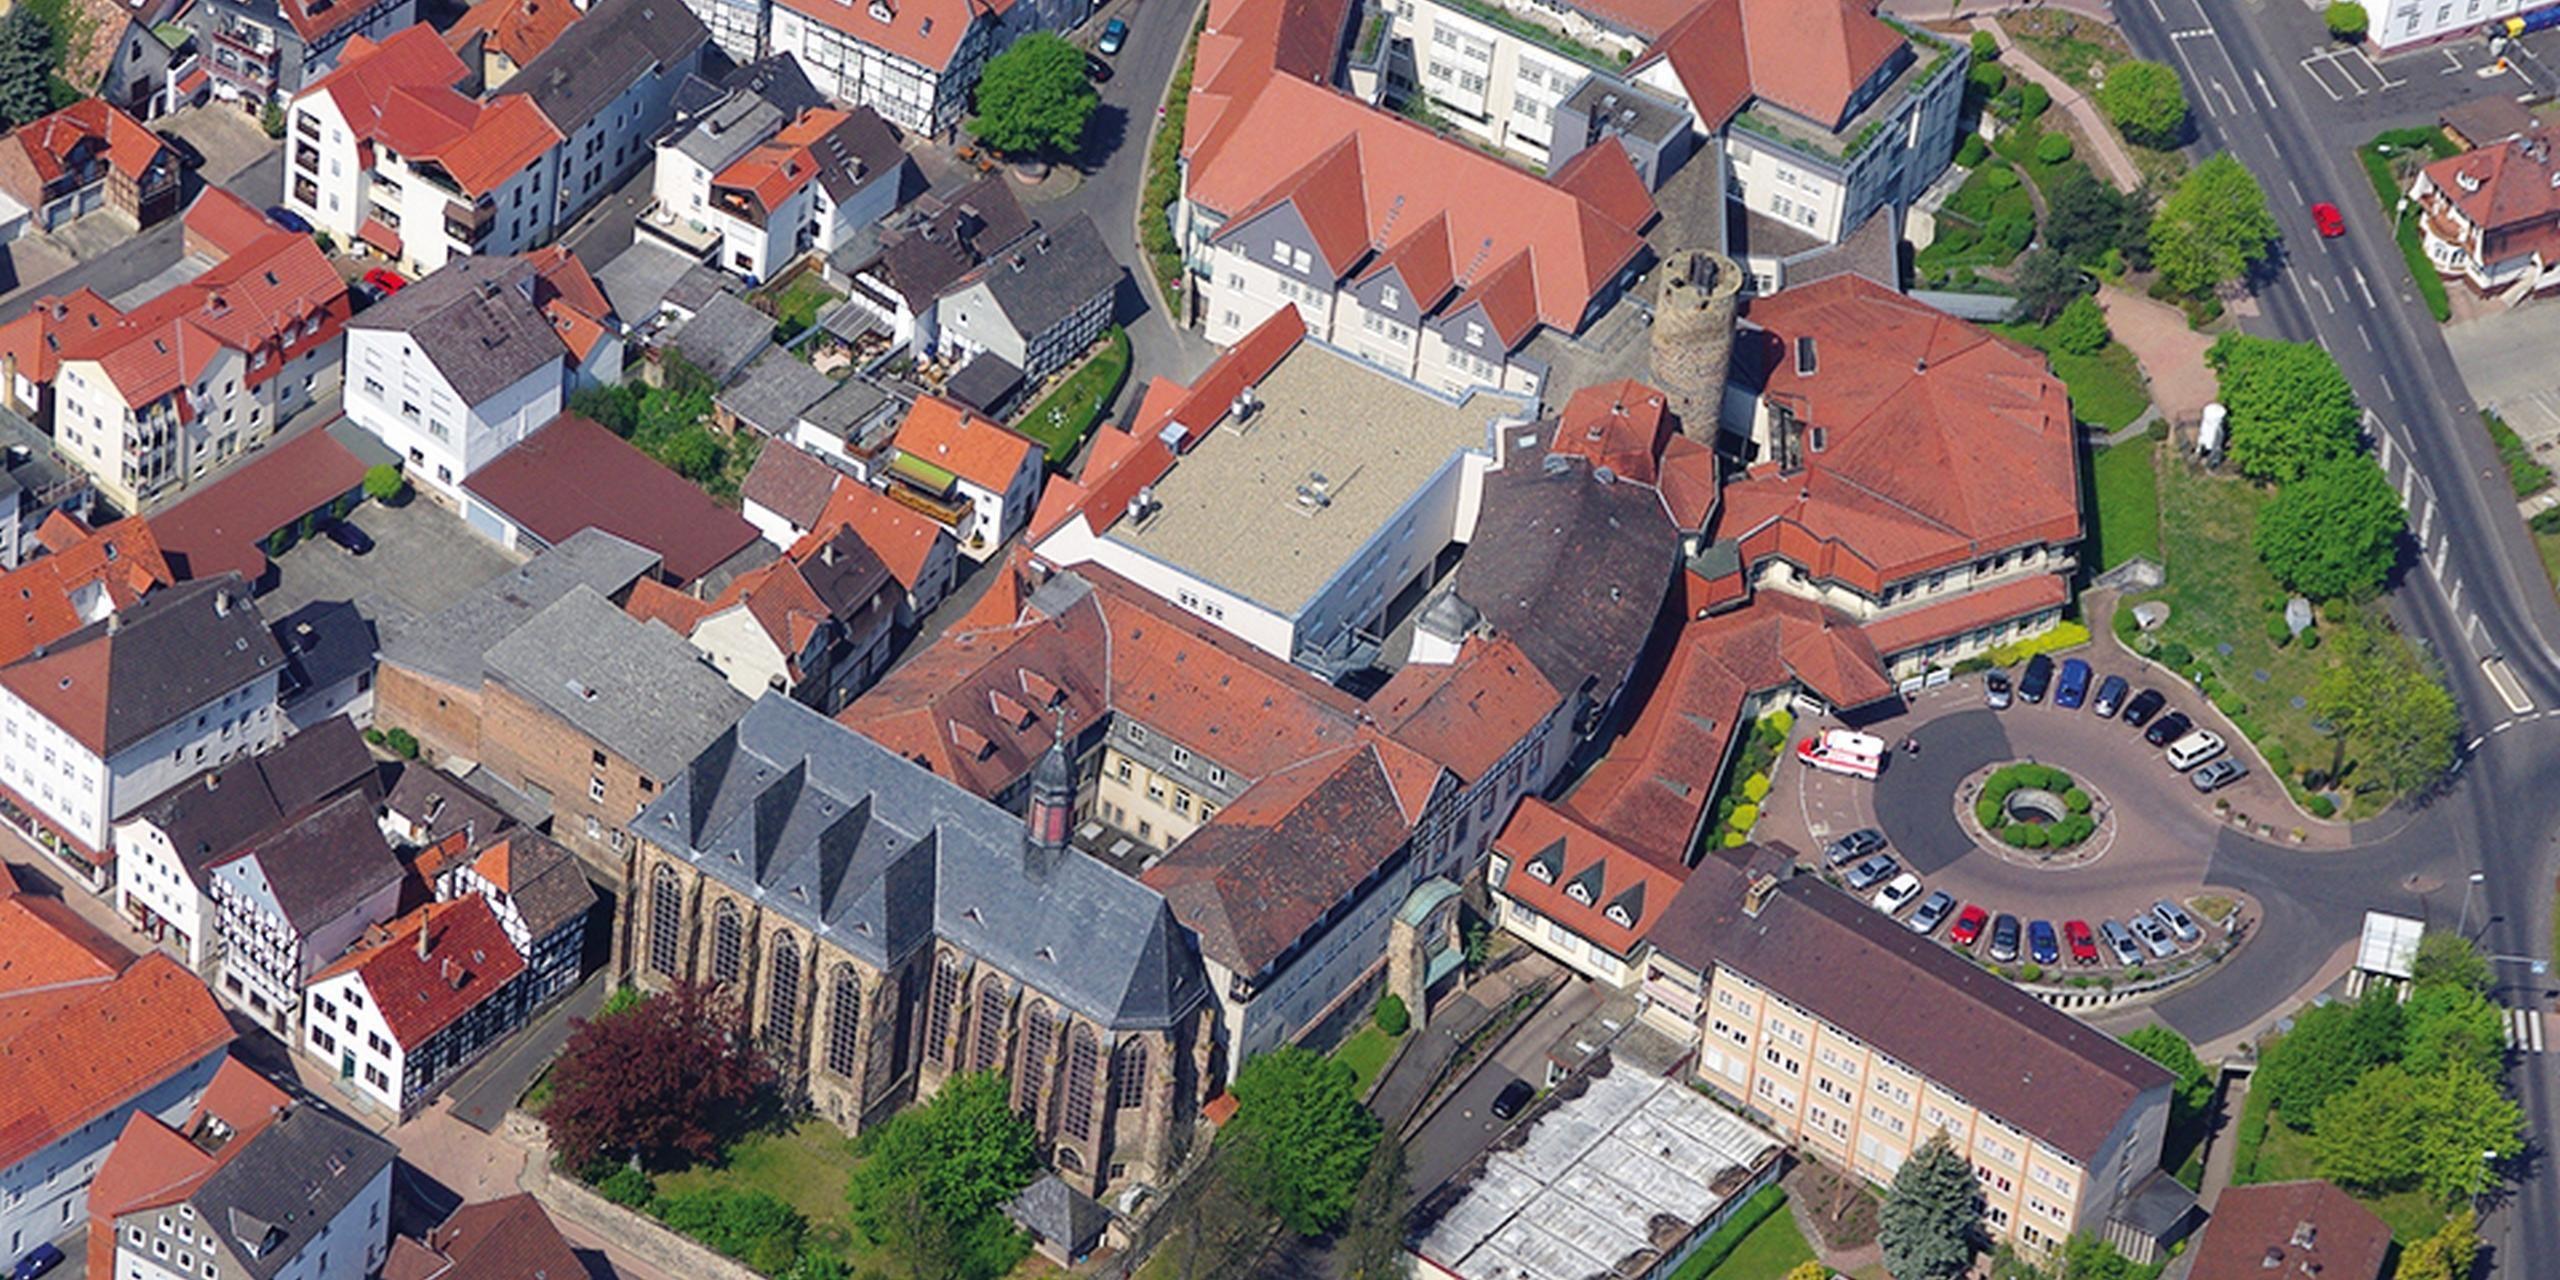 Meldung Kliniken Hospital Zum Heiligen Geist Fritzlar